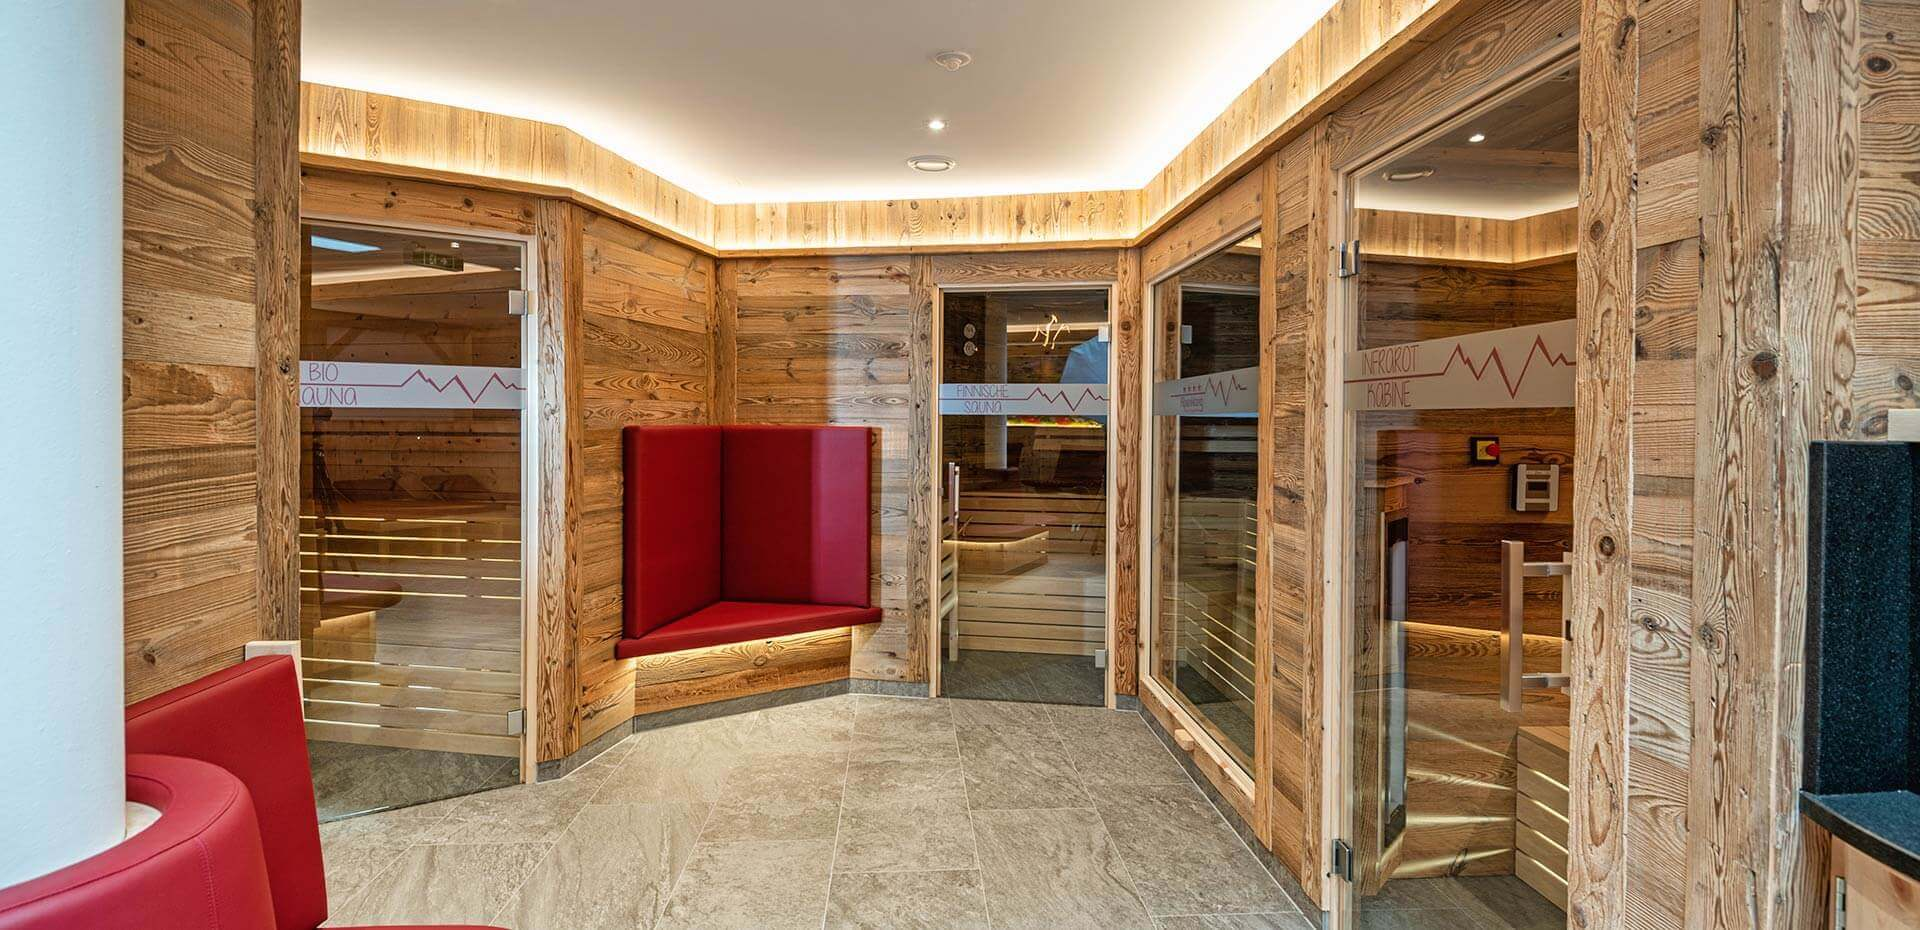 Wellnessbereich - Hotel Alpenklang in Großarl